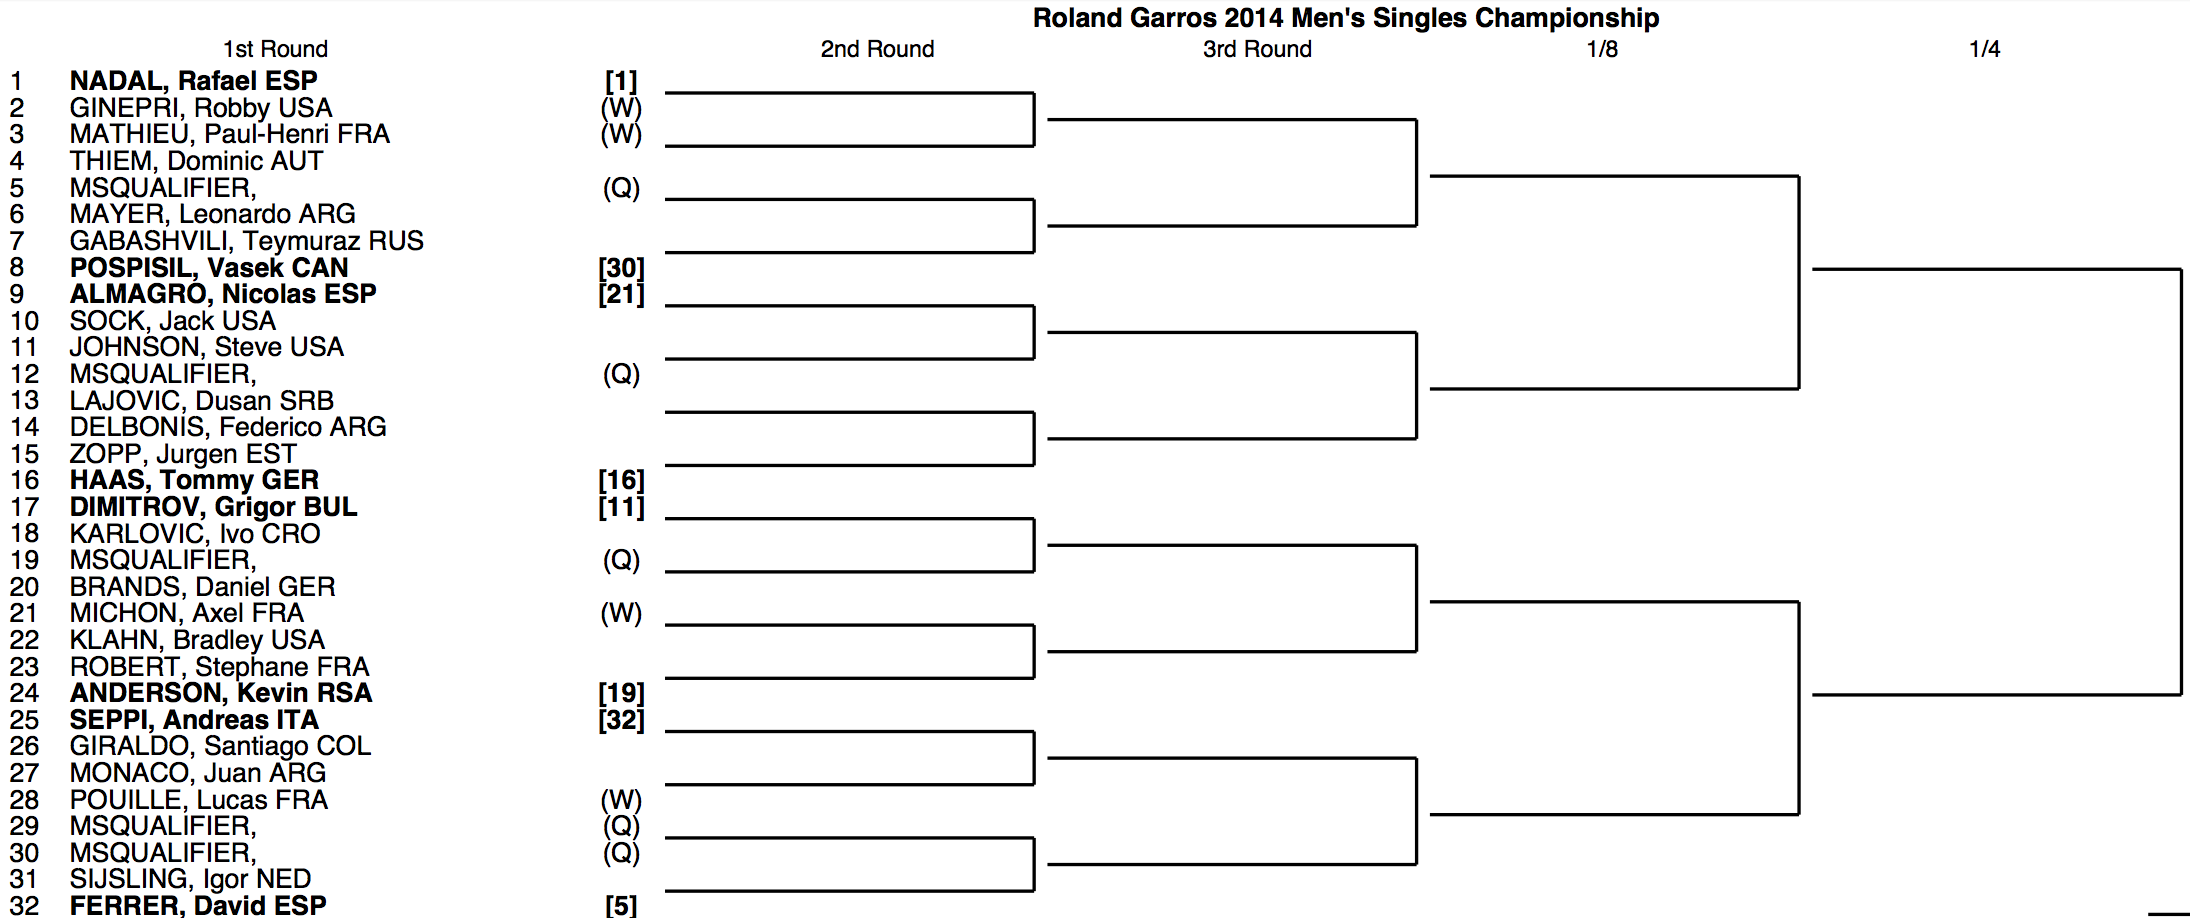 Roland Garros 2014 Draw 1:4